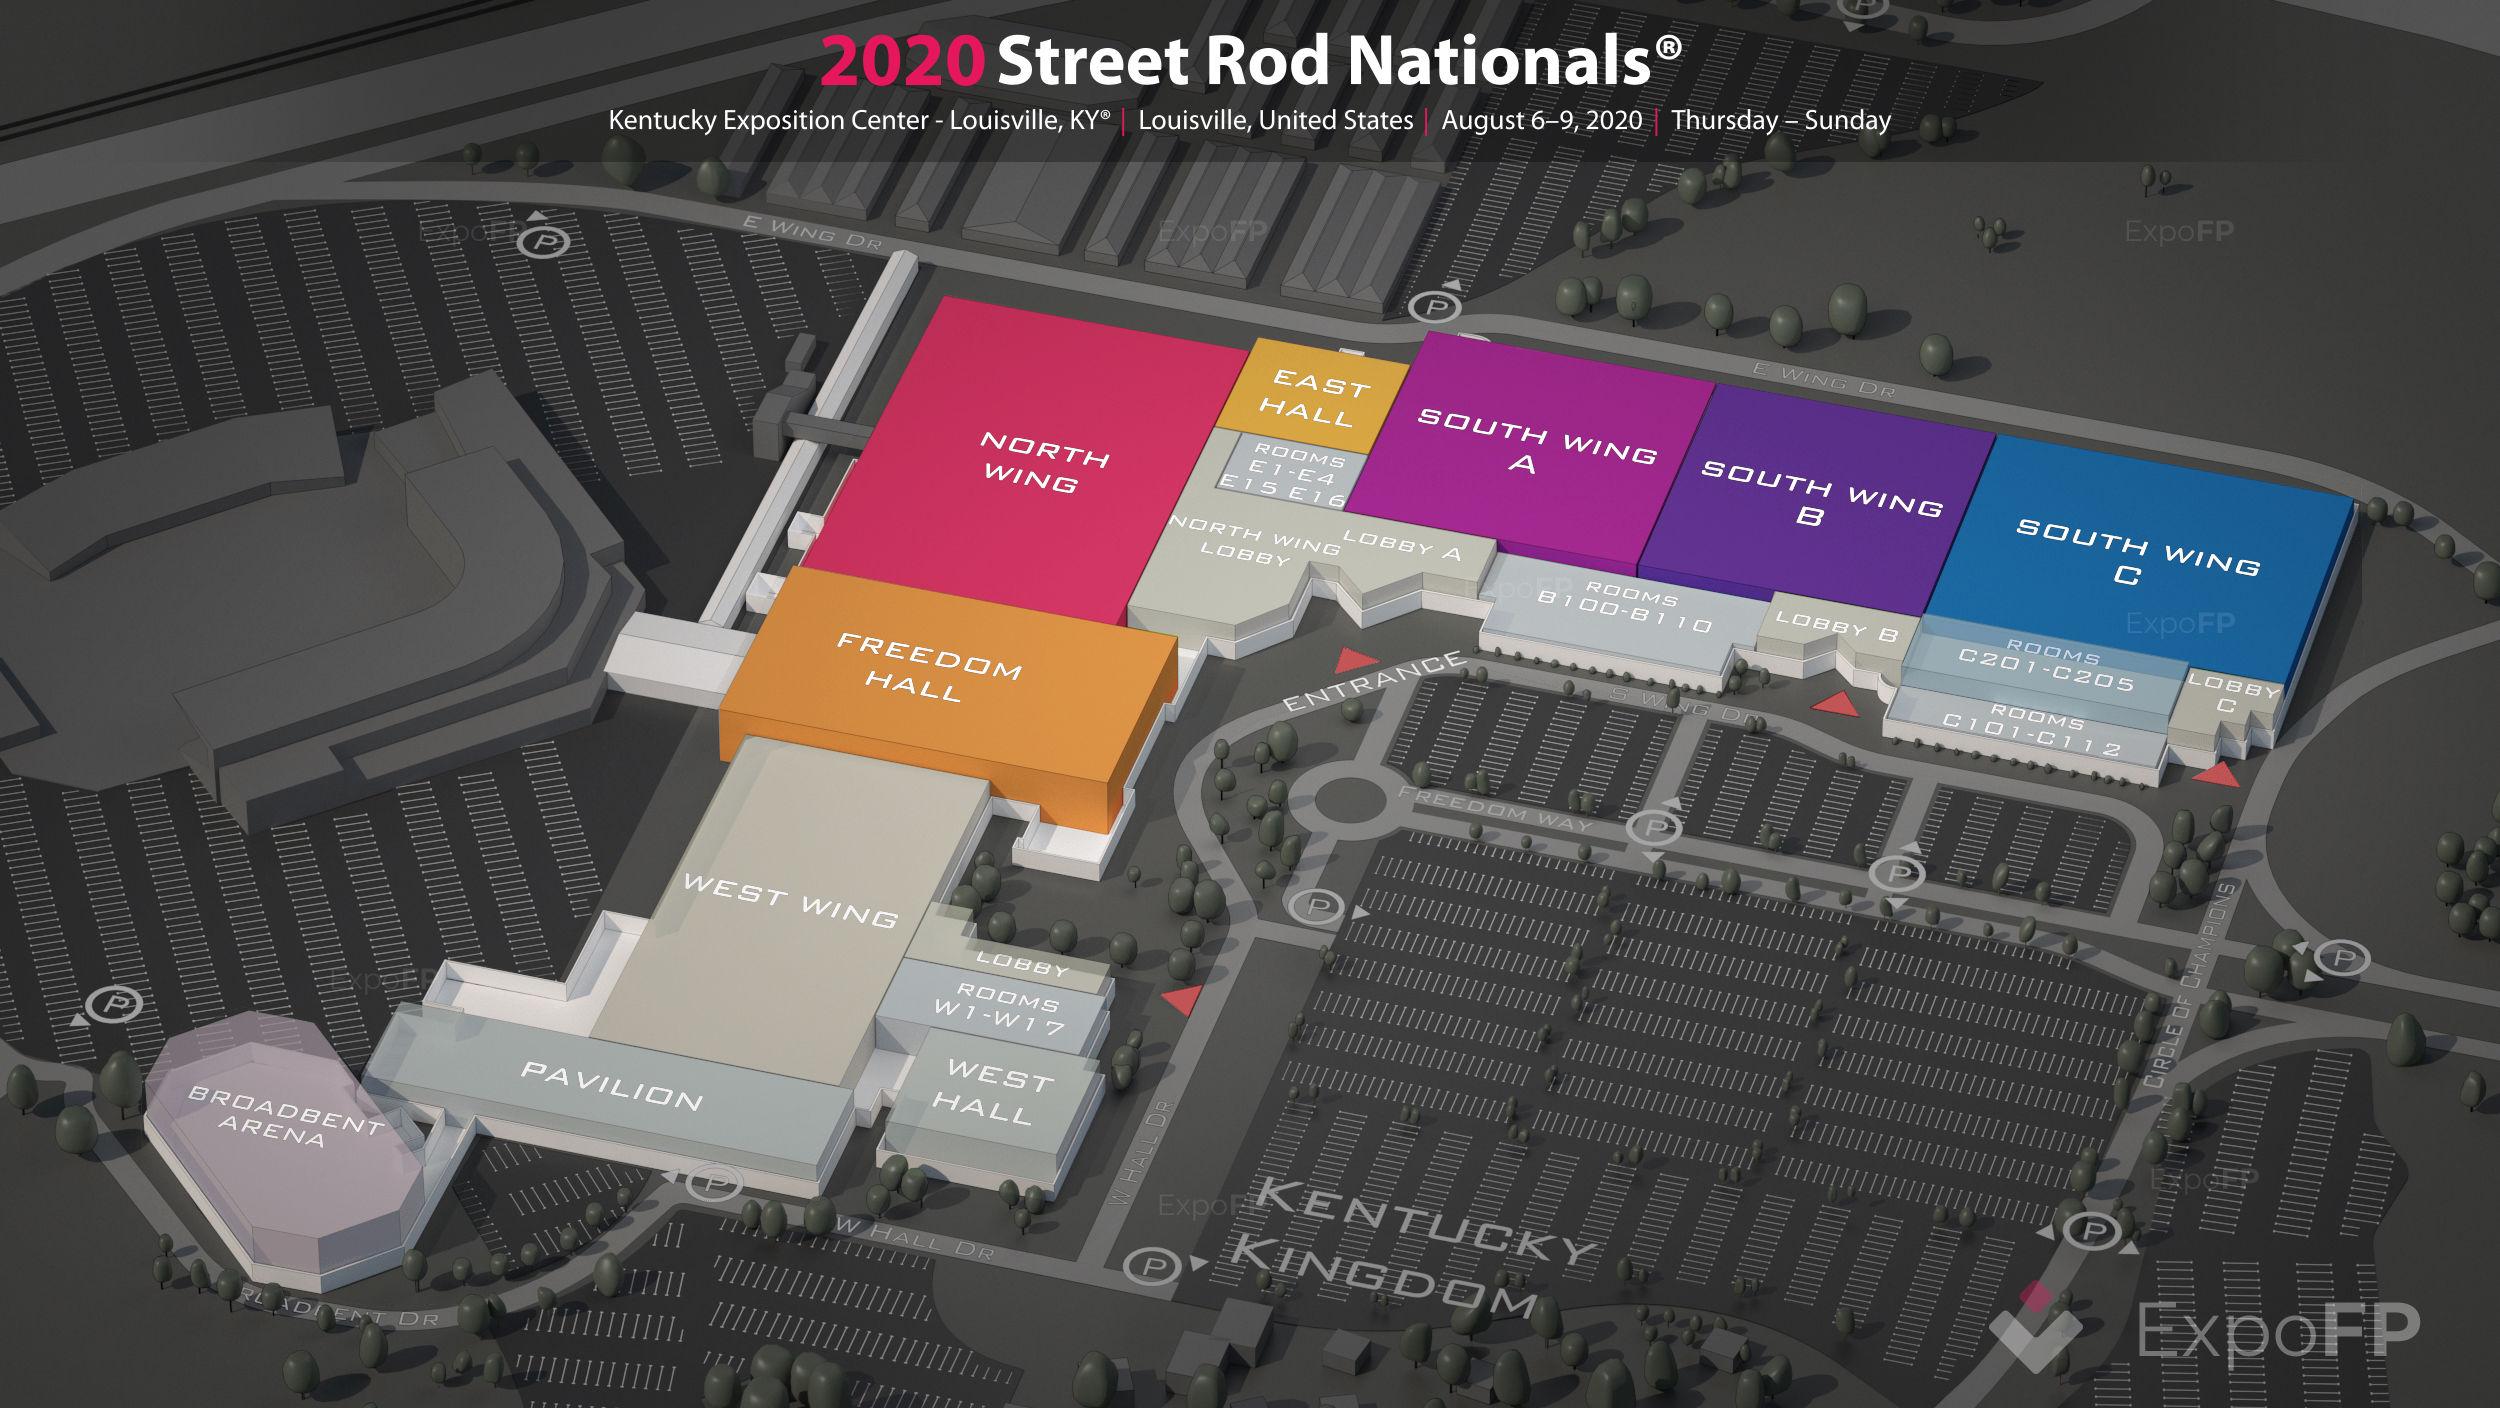 Street Rod Nationals 2020 In Kentucky Exposition Center